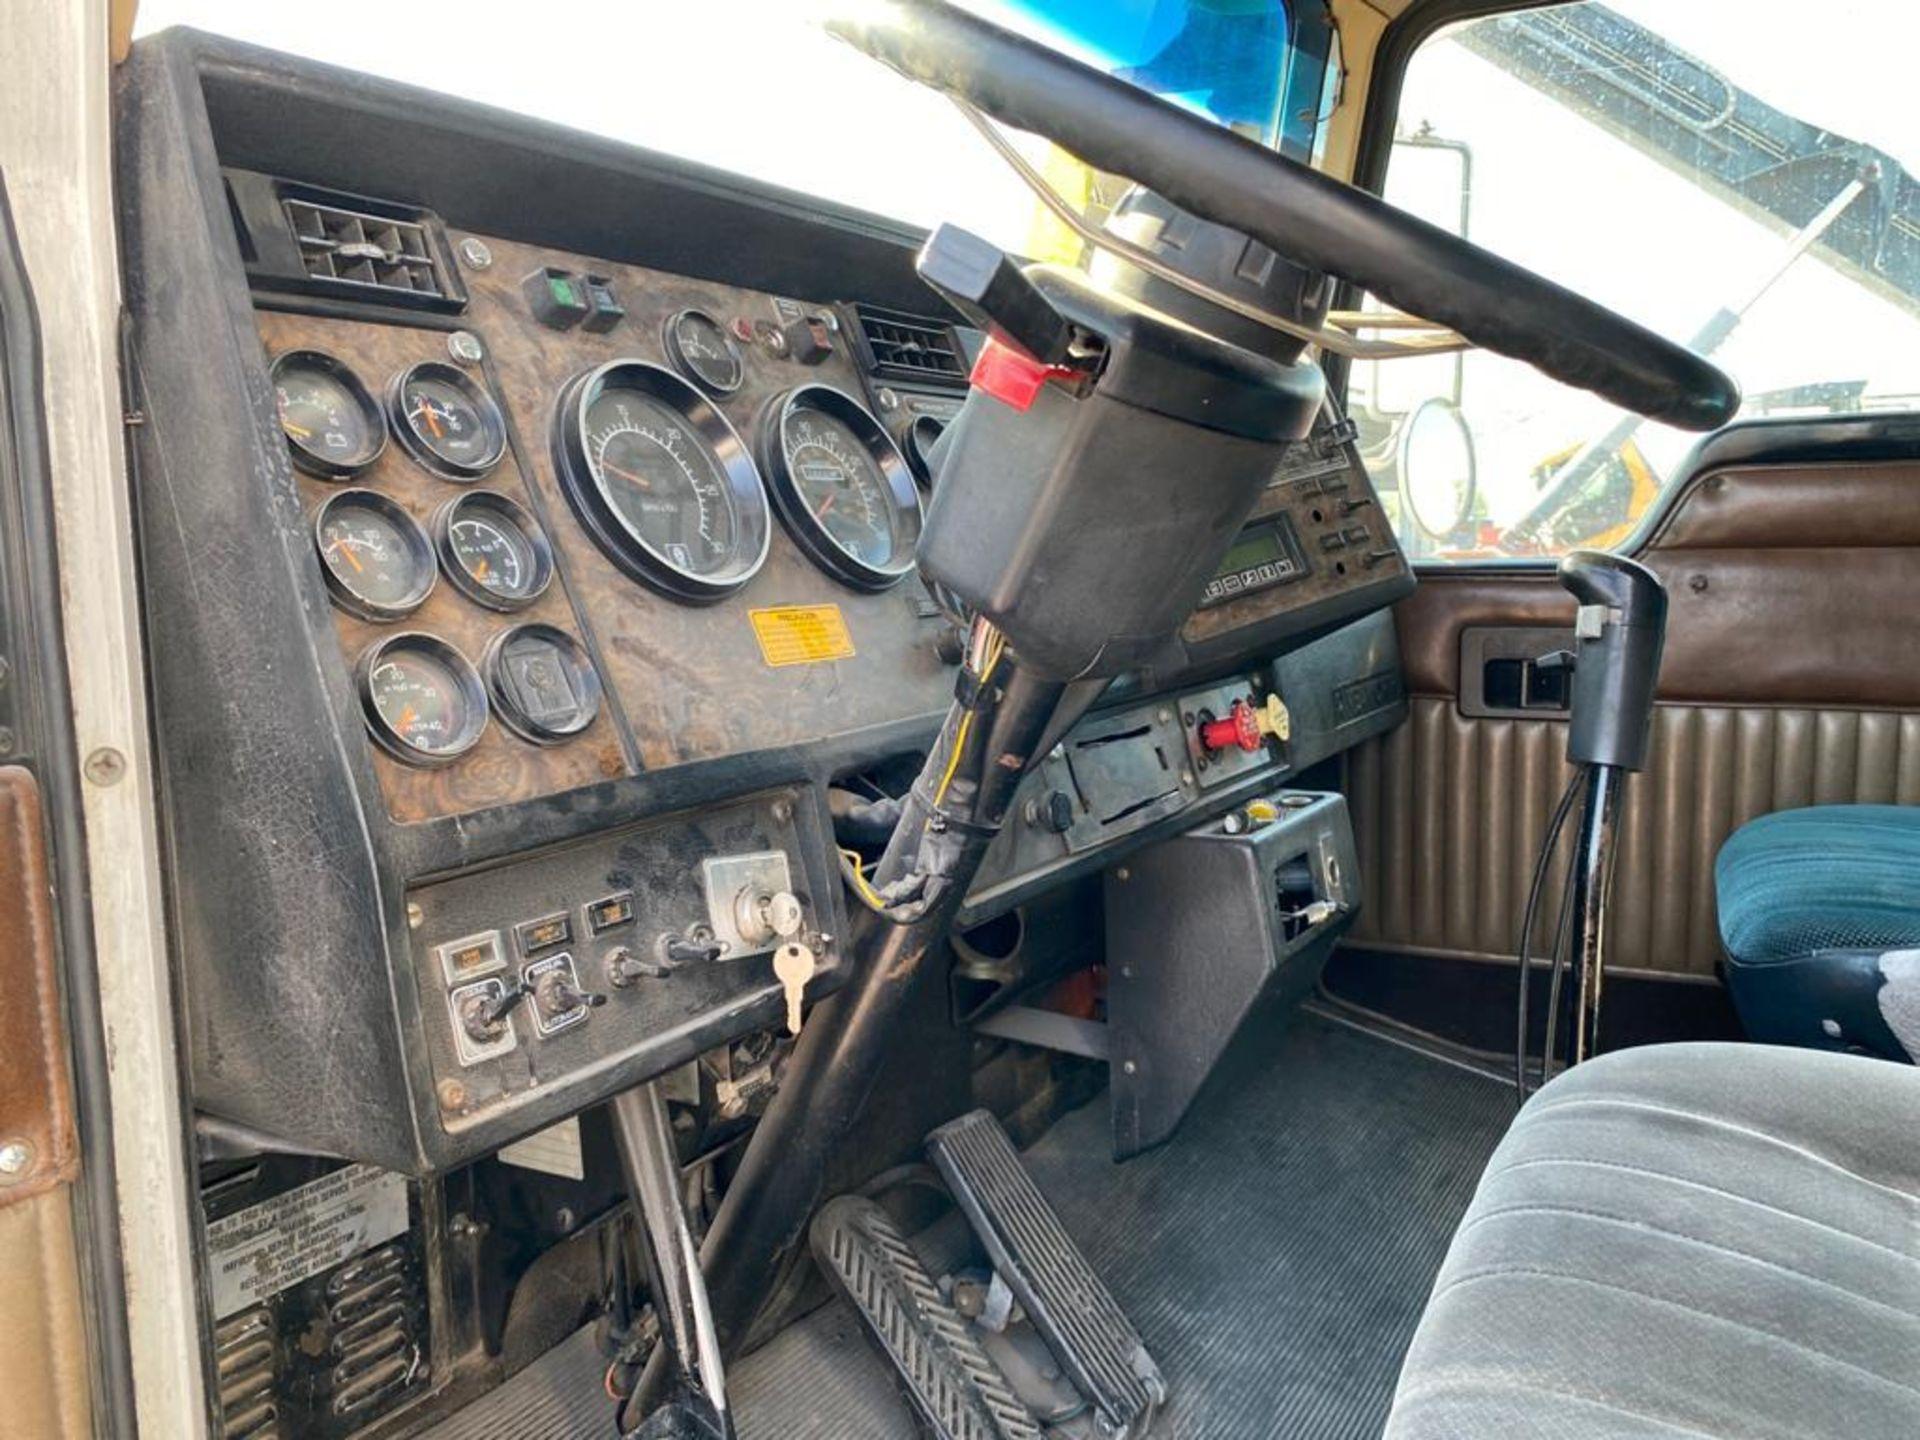 1998 Kenworth Sleeper Truck Tractor, standard transmission of 18 speeds - Image 38 of 55